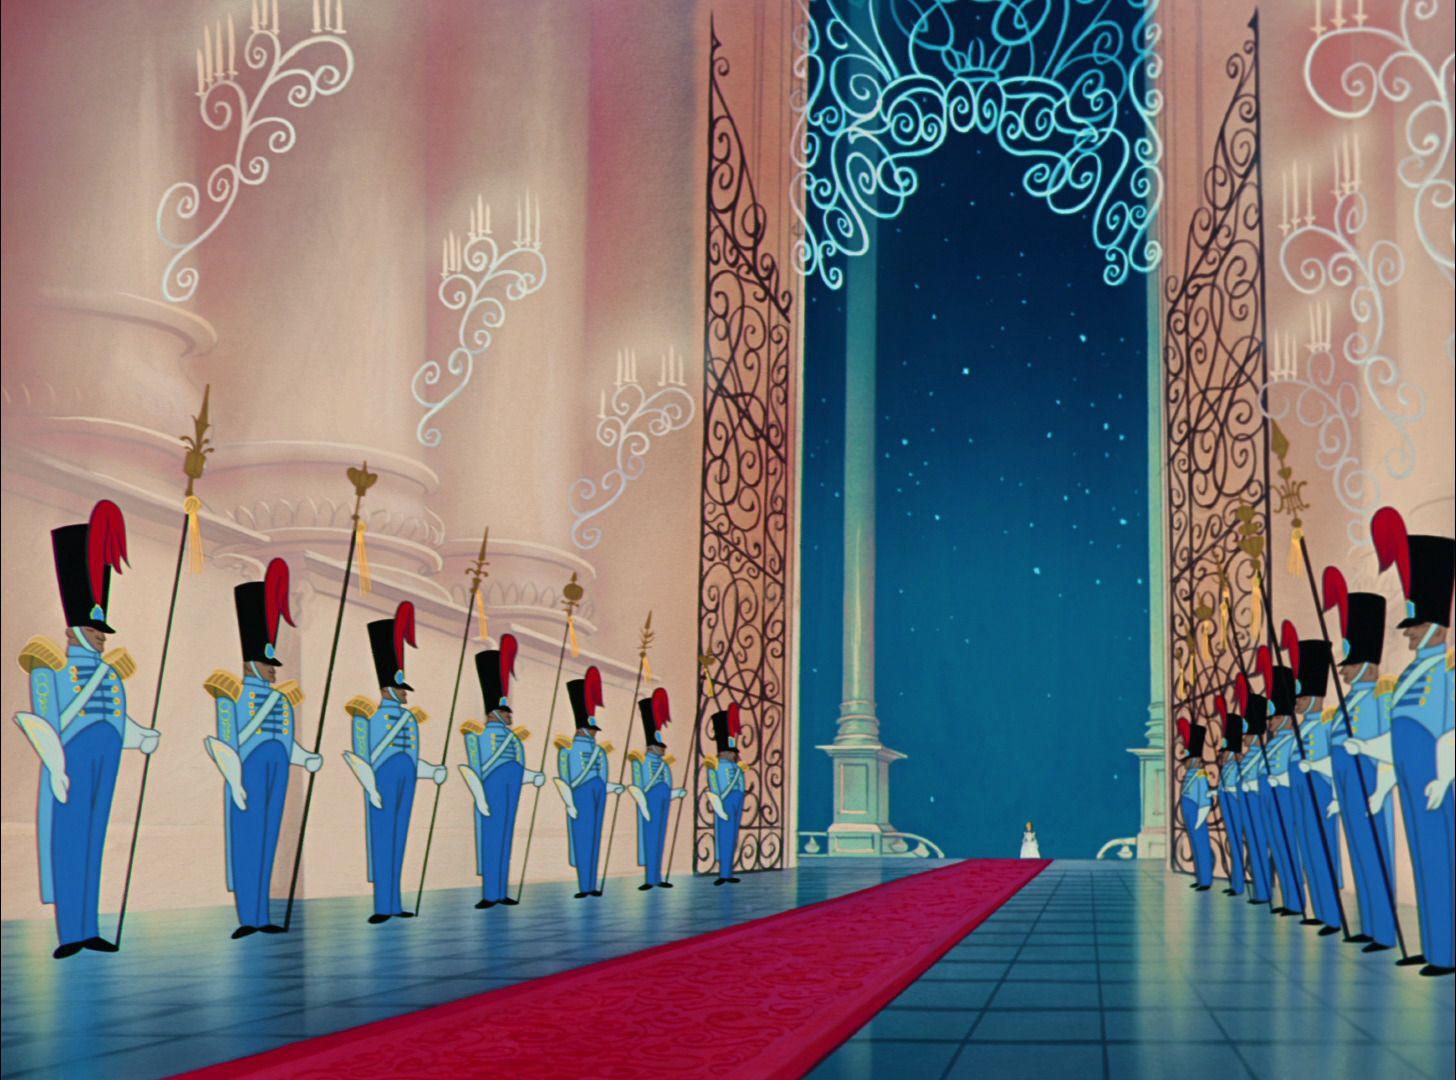 Day favorite scene cinderella at the ball